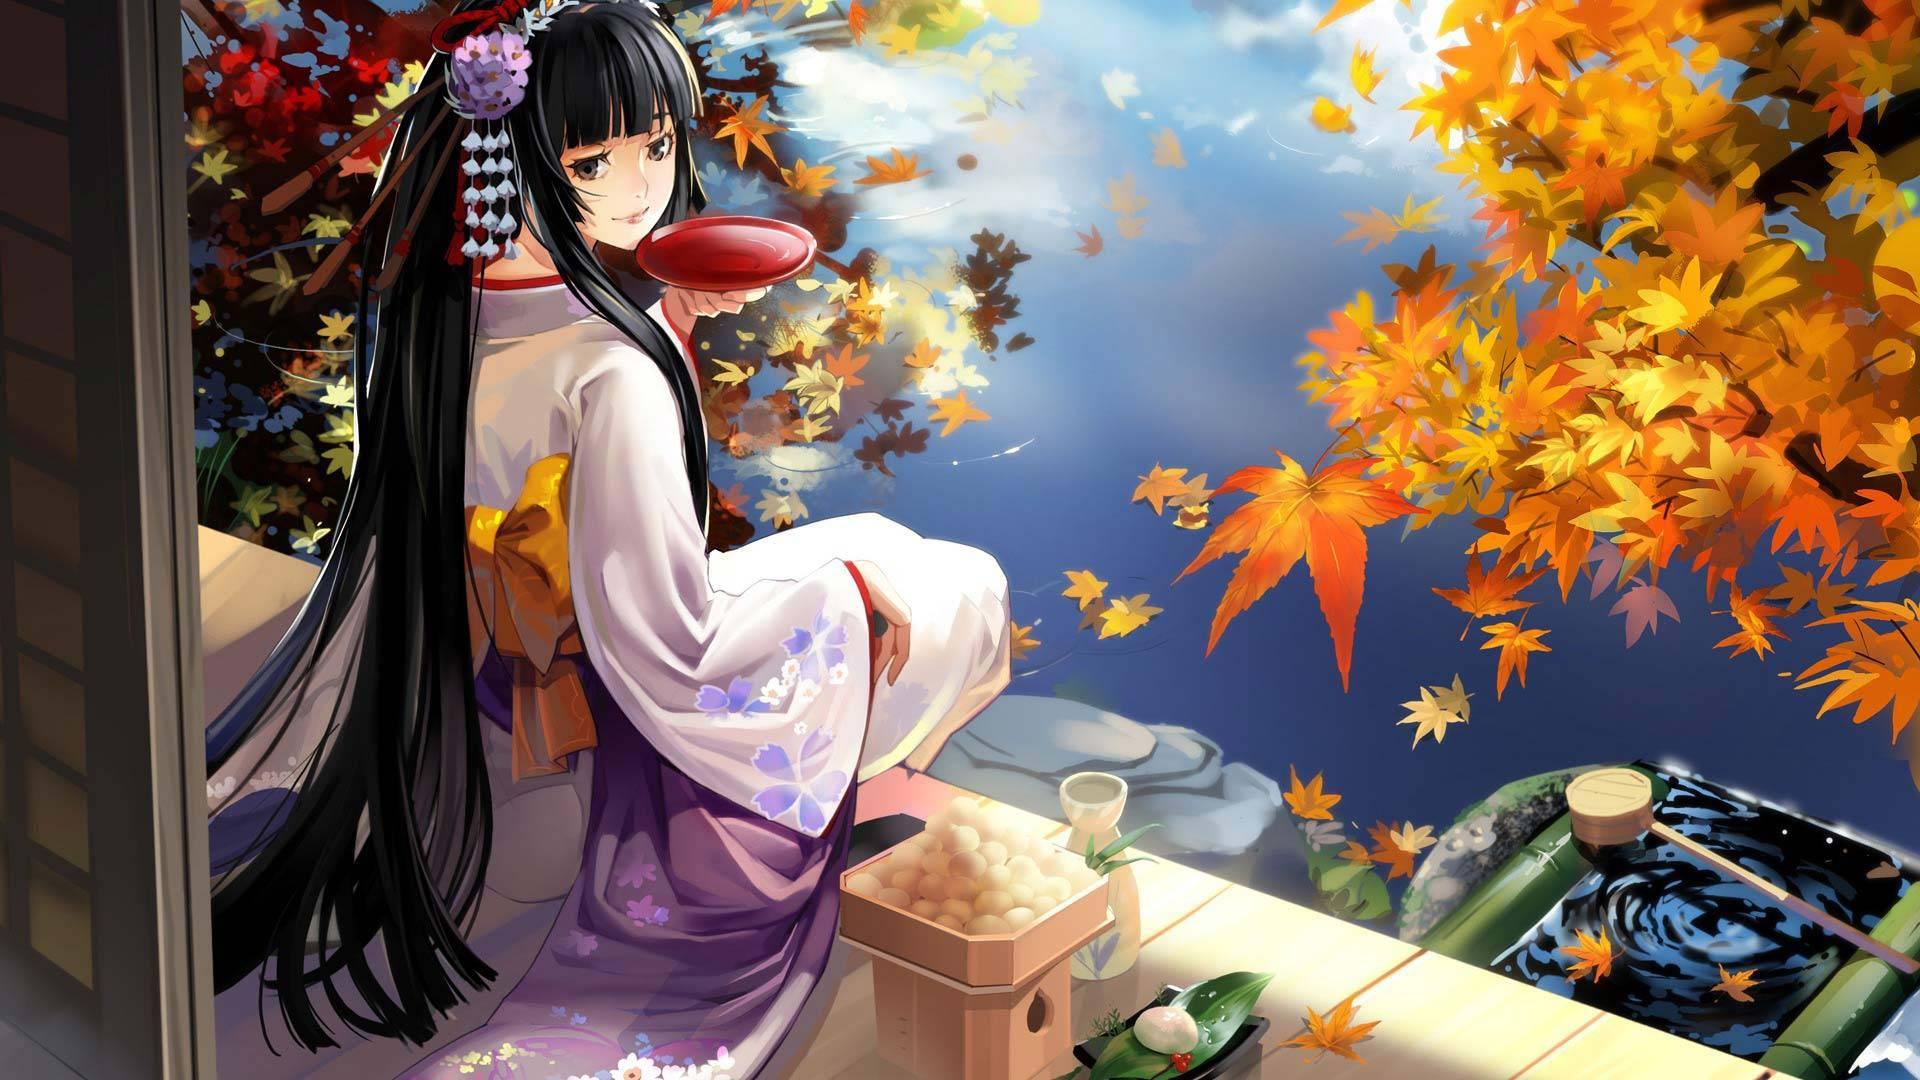 Anime Kimono Wallpapers Top Free Anime Kimono Backgrounds